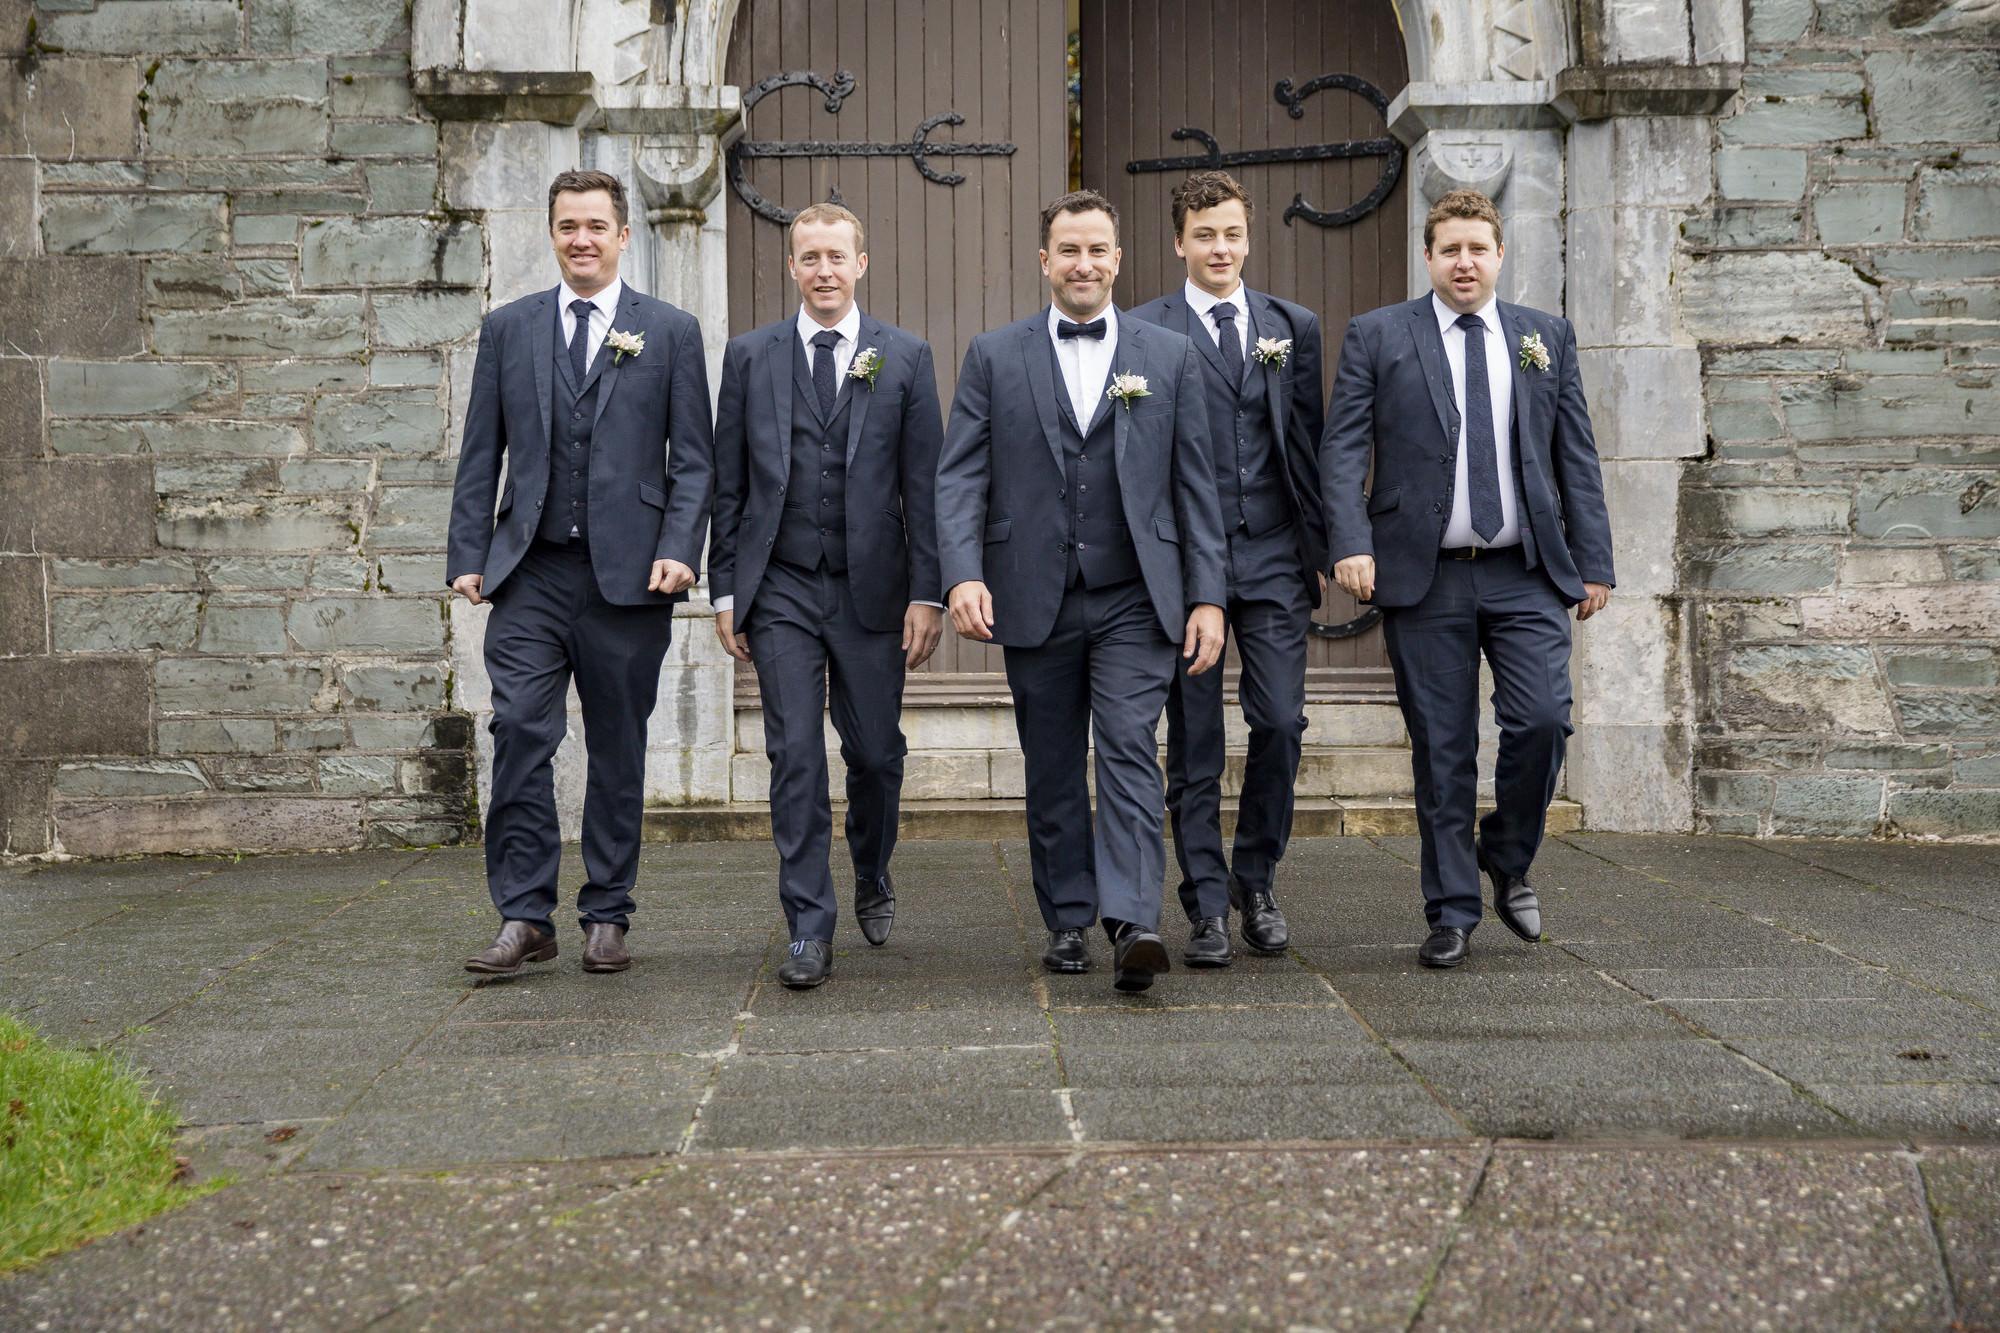 muckross_park_hotel_grougane_barra_wedding_photographer_goldenmoments_027.jpg